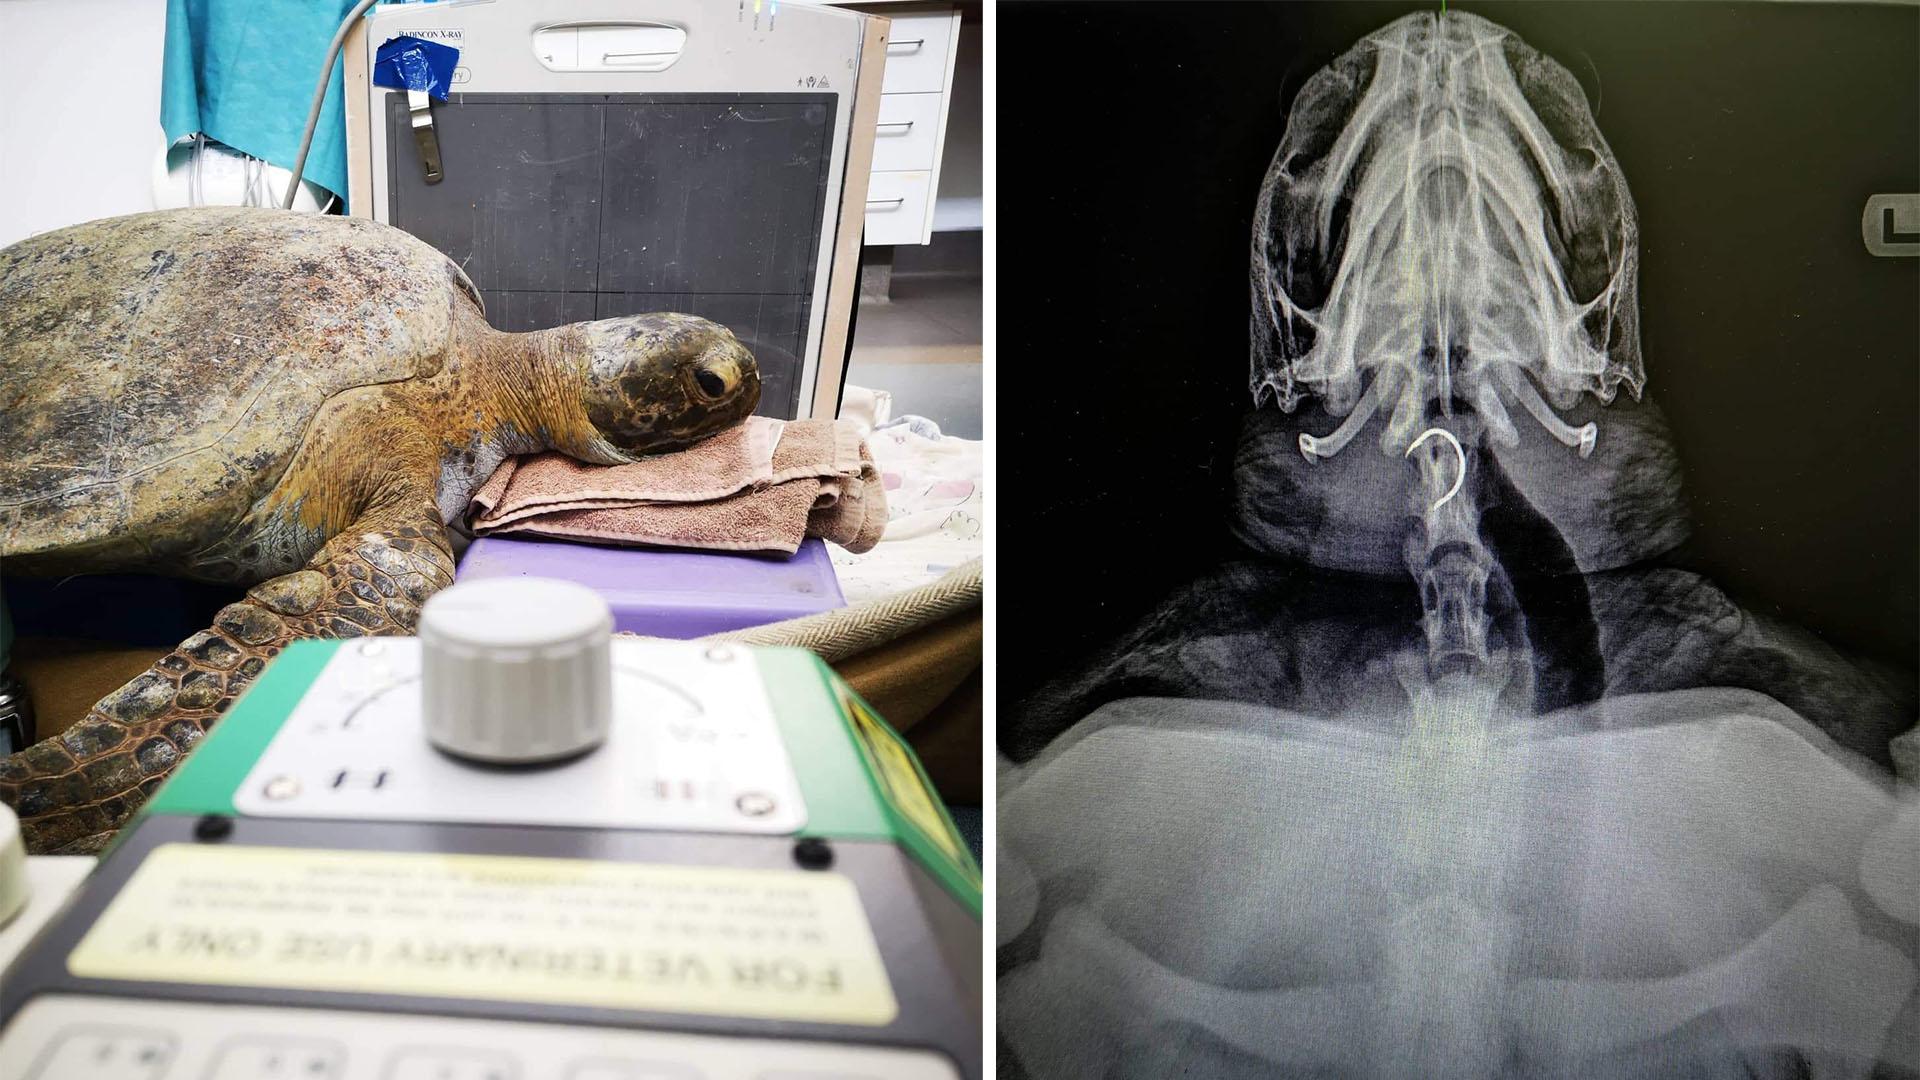 https://rfacdn.nz/zoo/assets/media/turtle-double-image-gallery.jpg